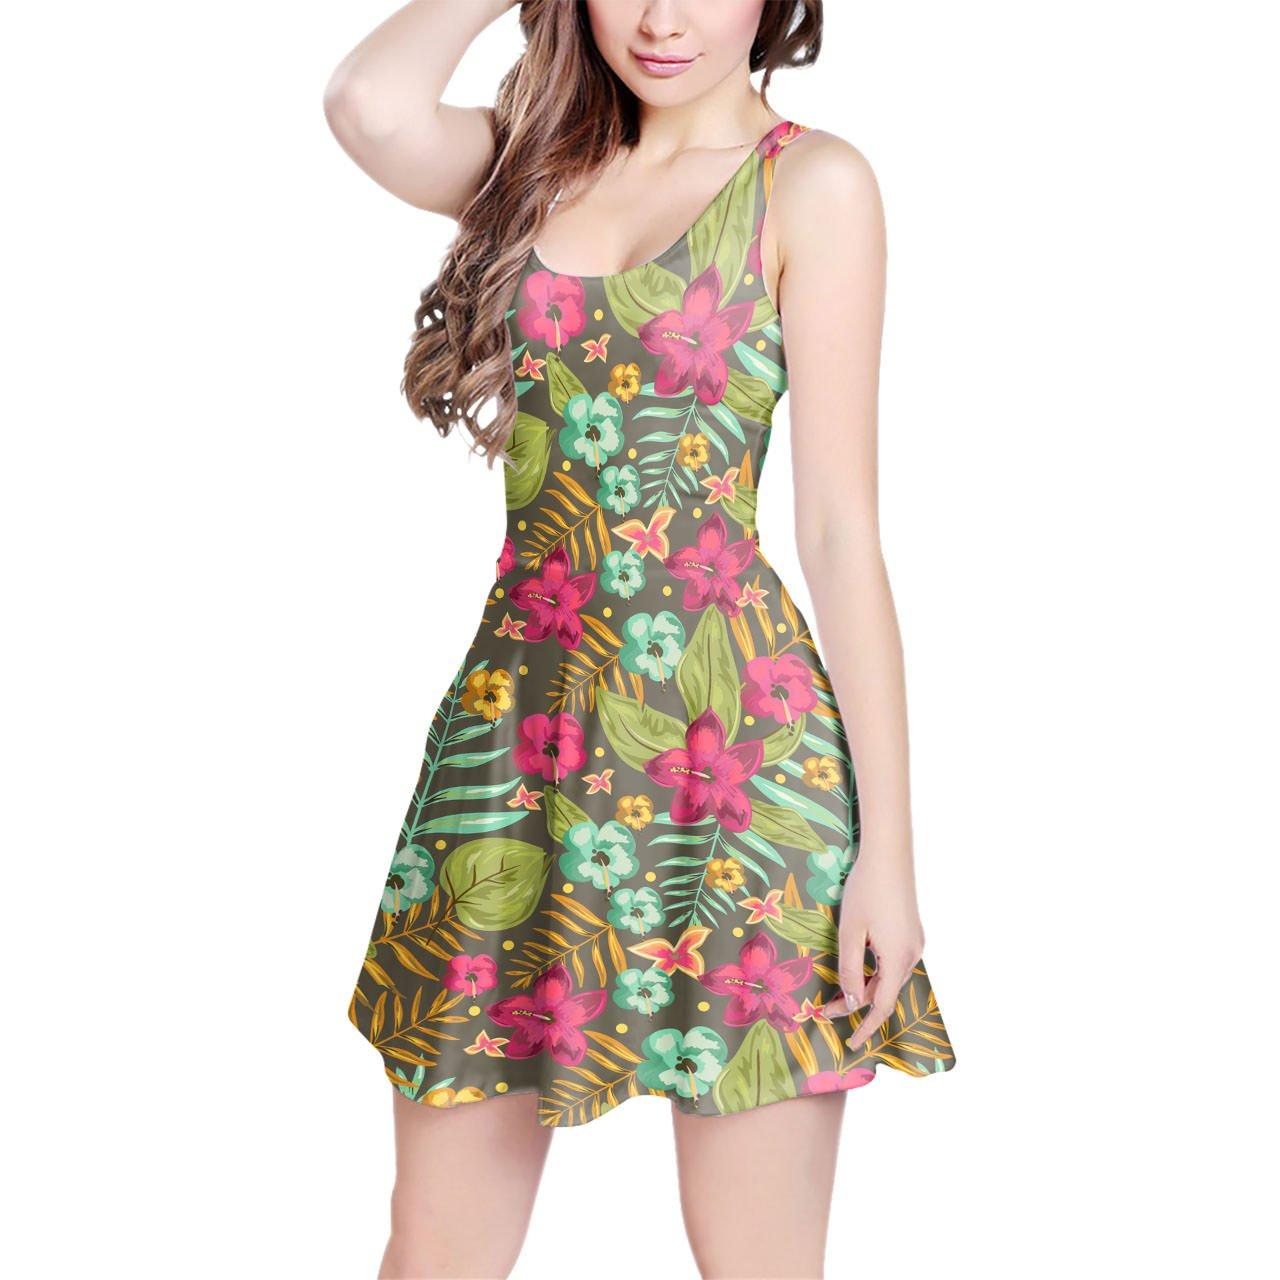 Retro Hawaii Blooms Sleeveless Dress XS-3XL Skater Stretch Flare Dress